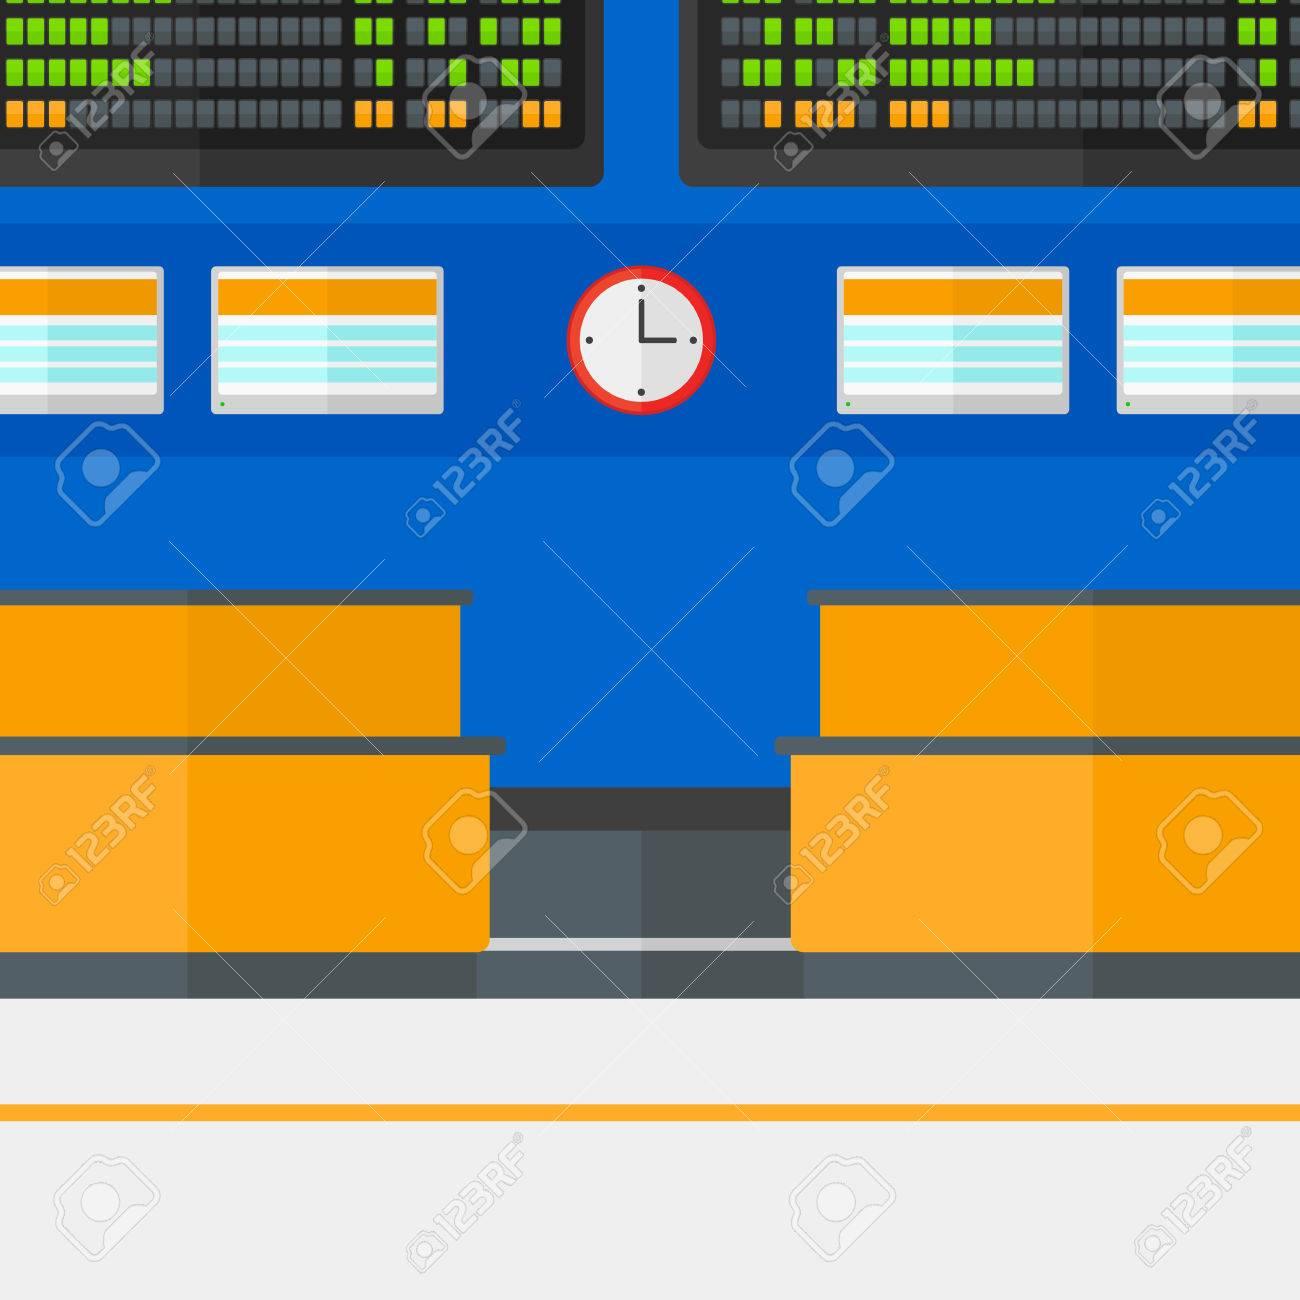 background of schedule board in airport vector flat design